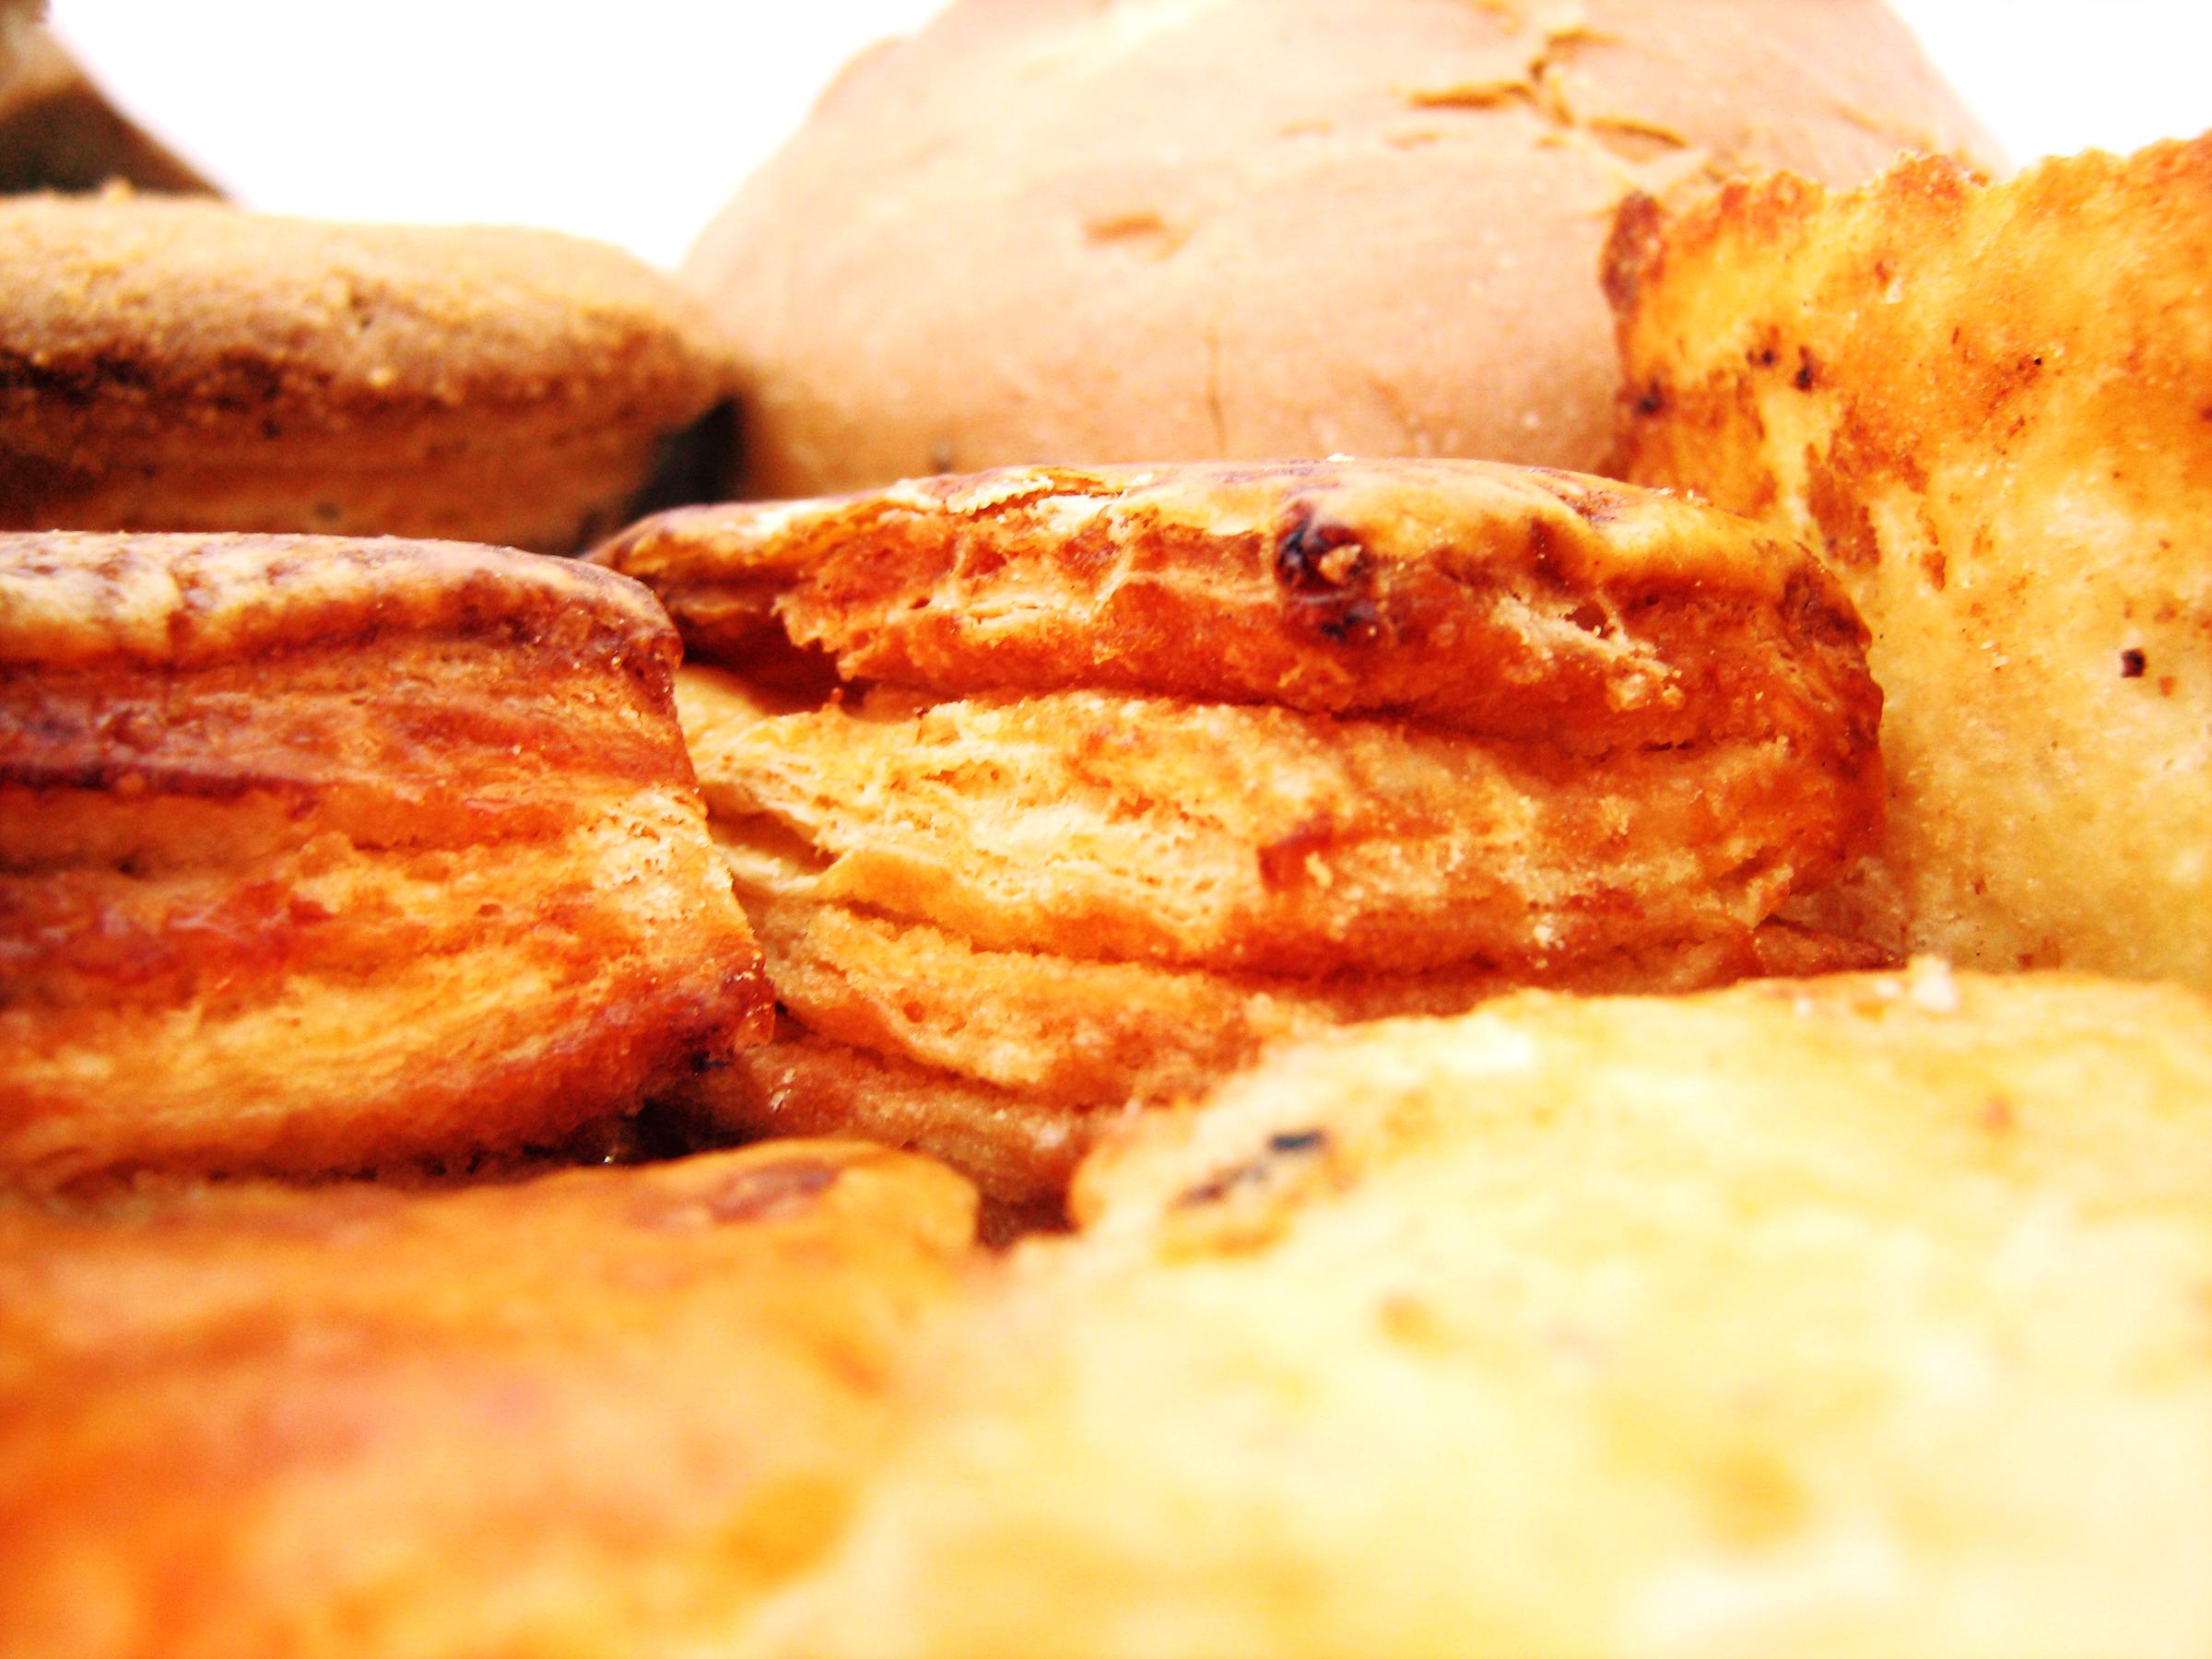 Buns, Bakery, Breakfast, Bun, Food, HQ Photo